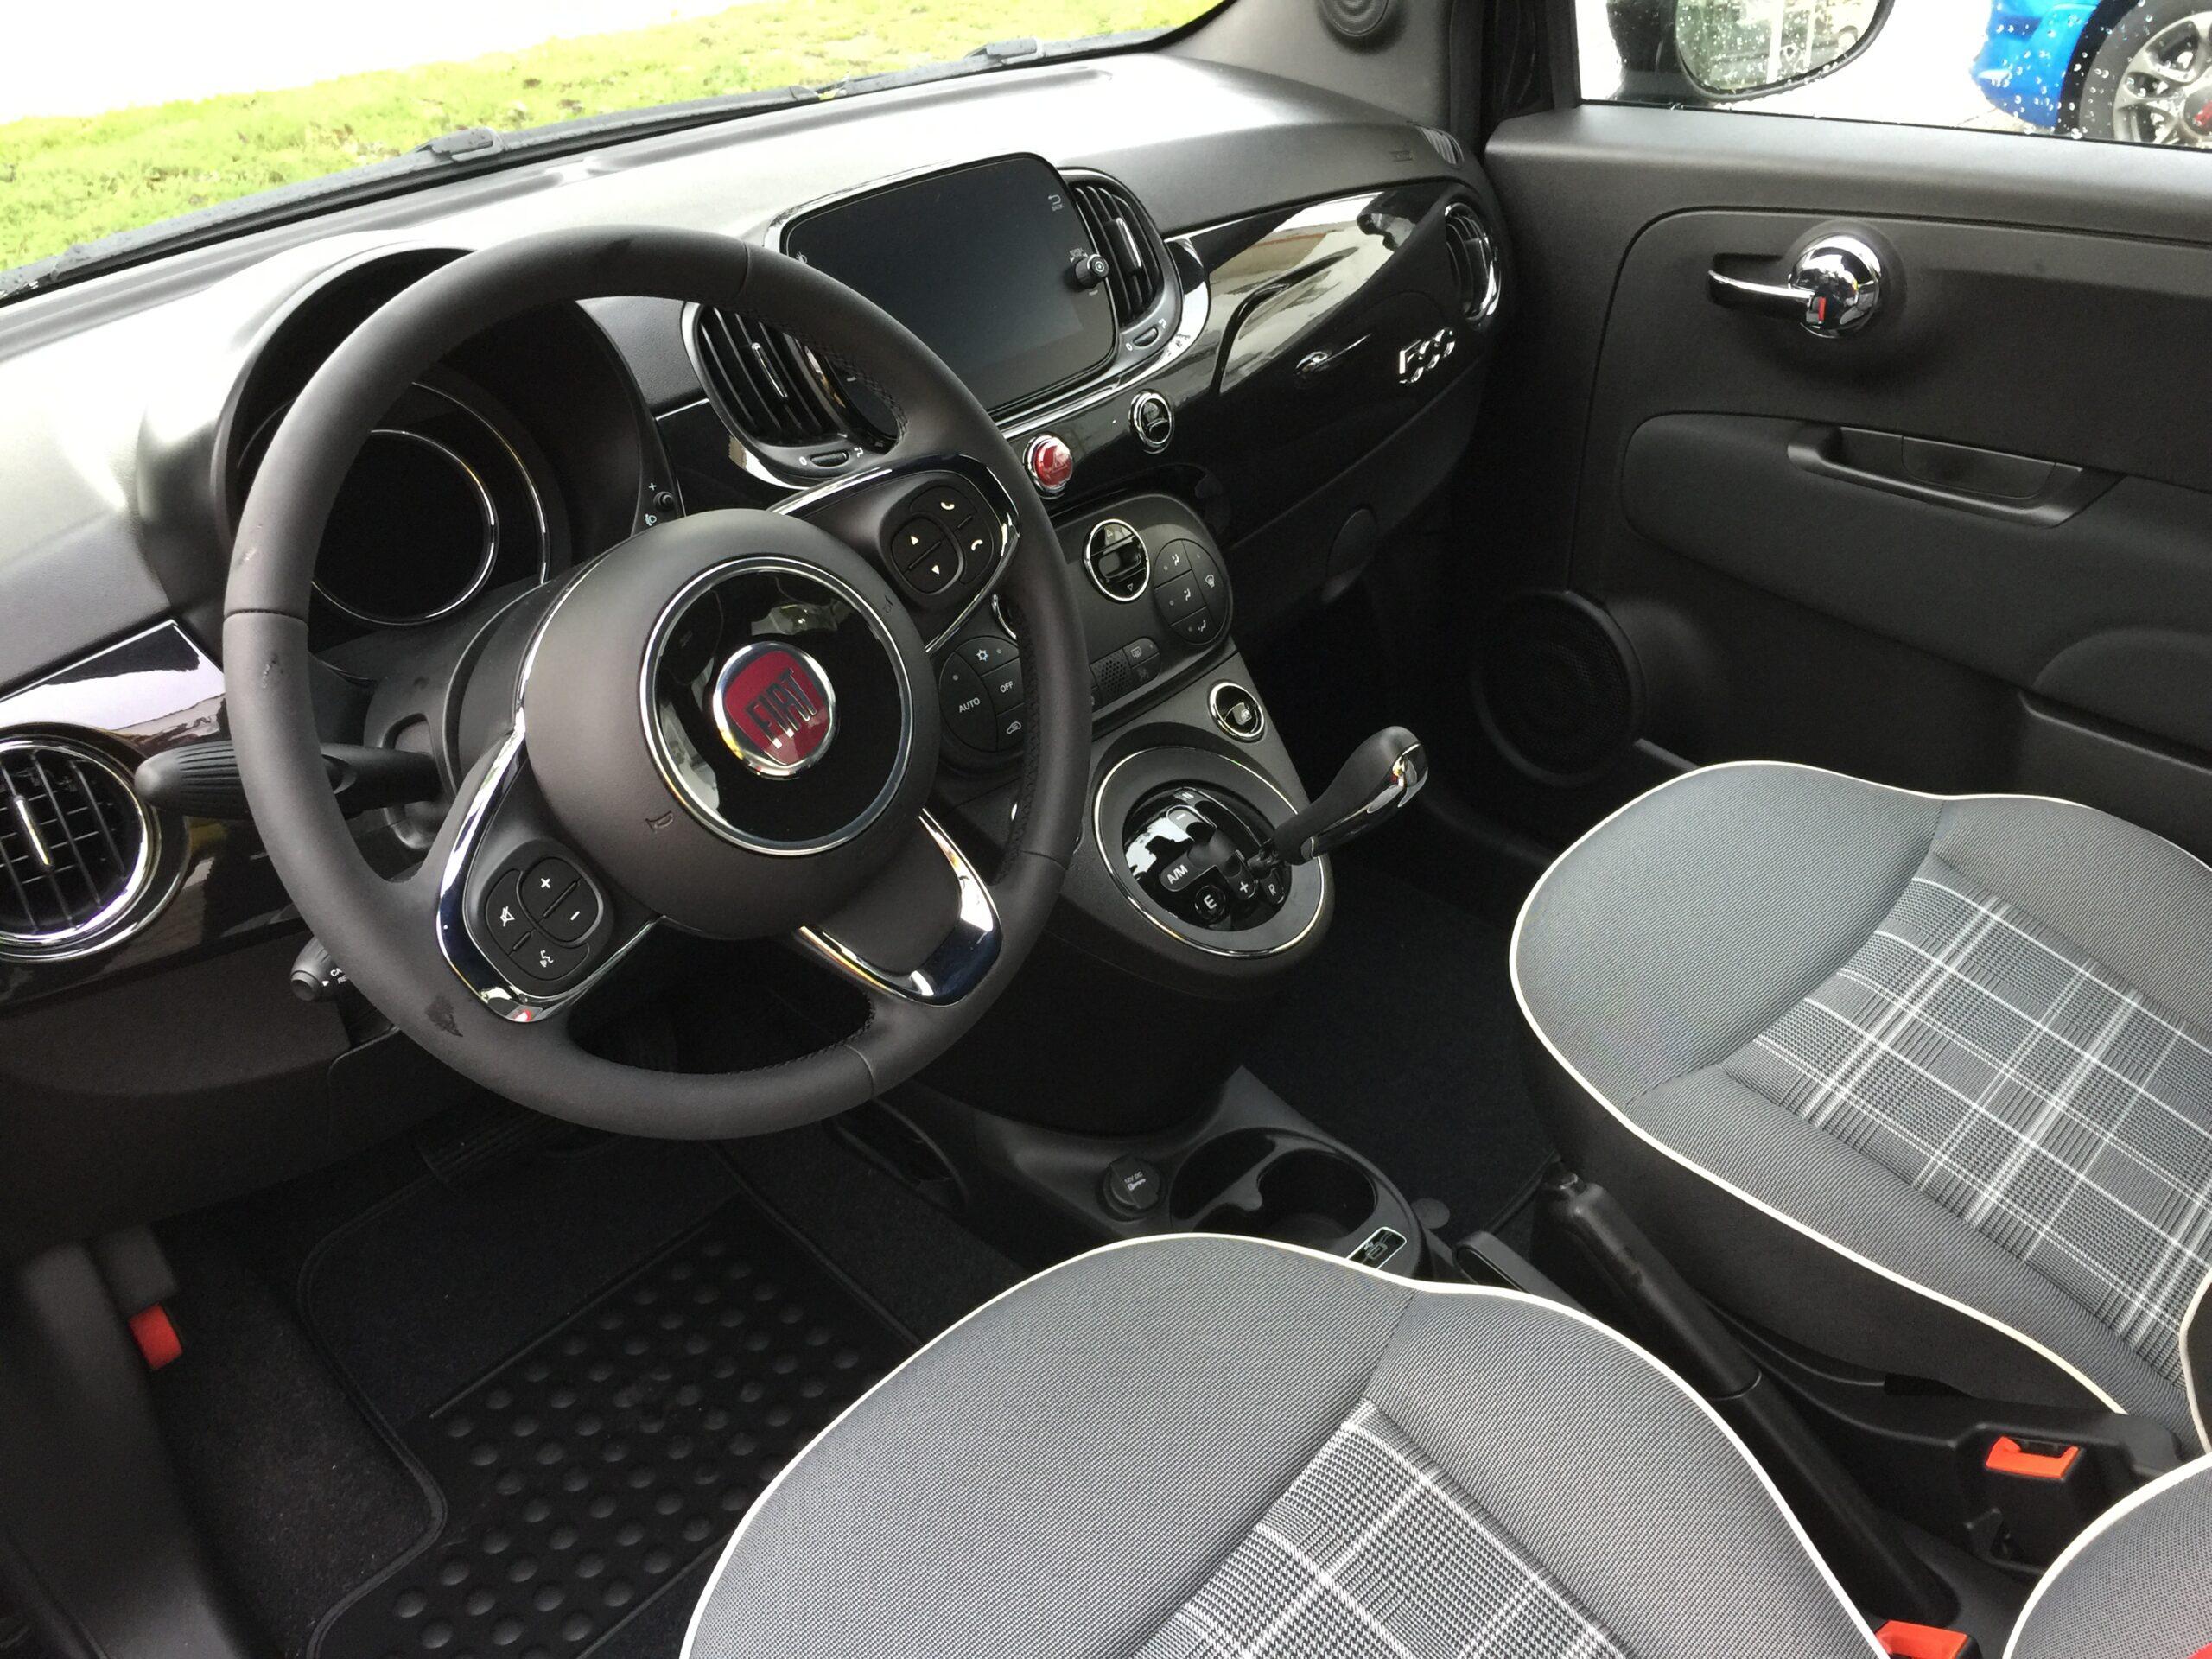 Fiat 500 1.2 FIRE 70 Dualogic Lounge, NEUWAGEN full